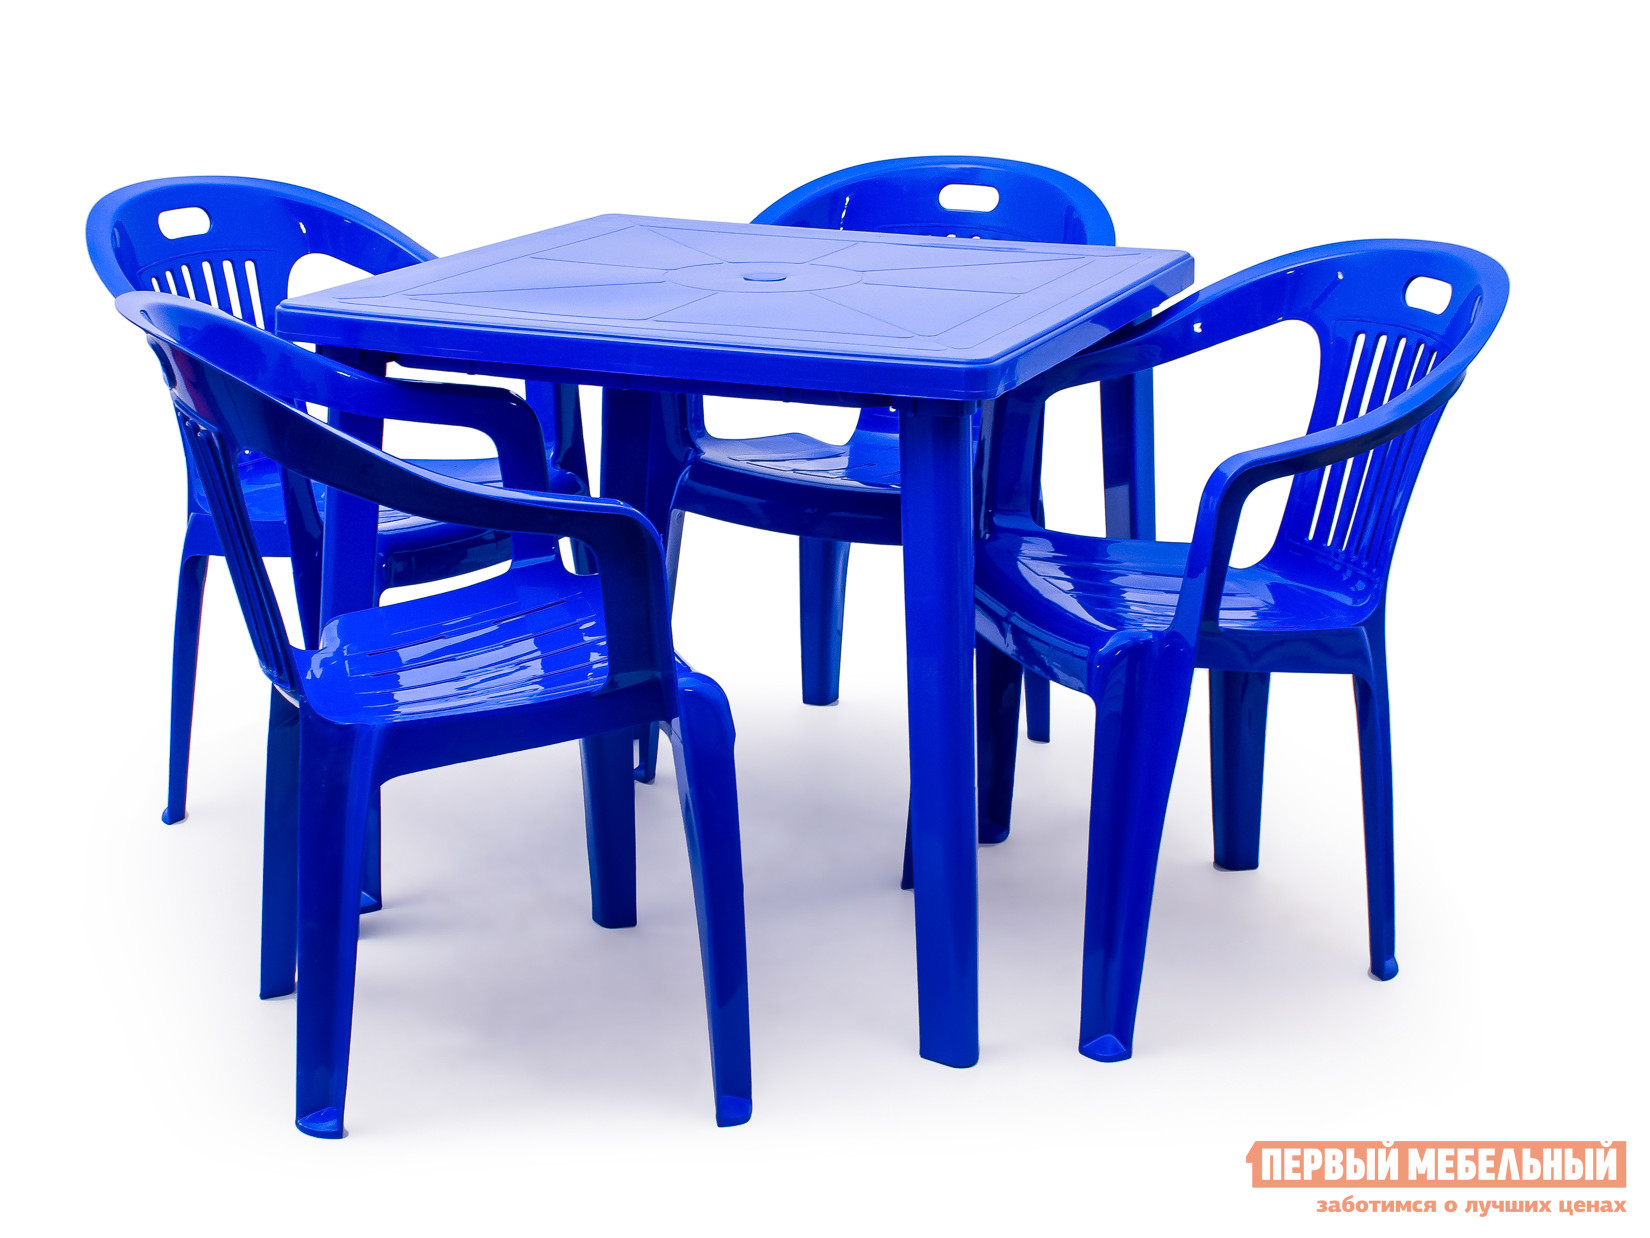 "Набор пластиковой мебели Стандарт Пластик Стол квадратный (800х800х710) + Кресло №5 ""Комфорт-1"" (540x535x780мм), 4 шт. Синий"